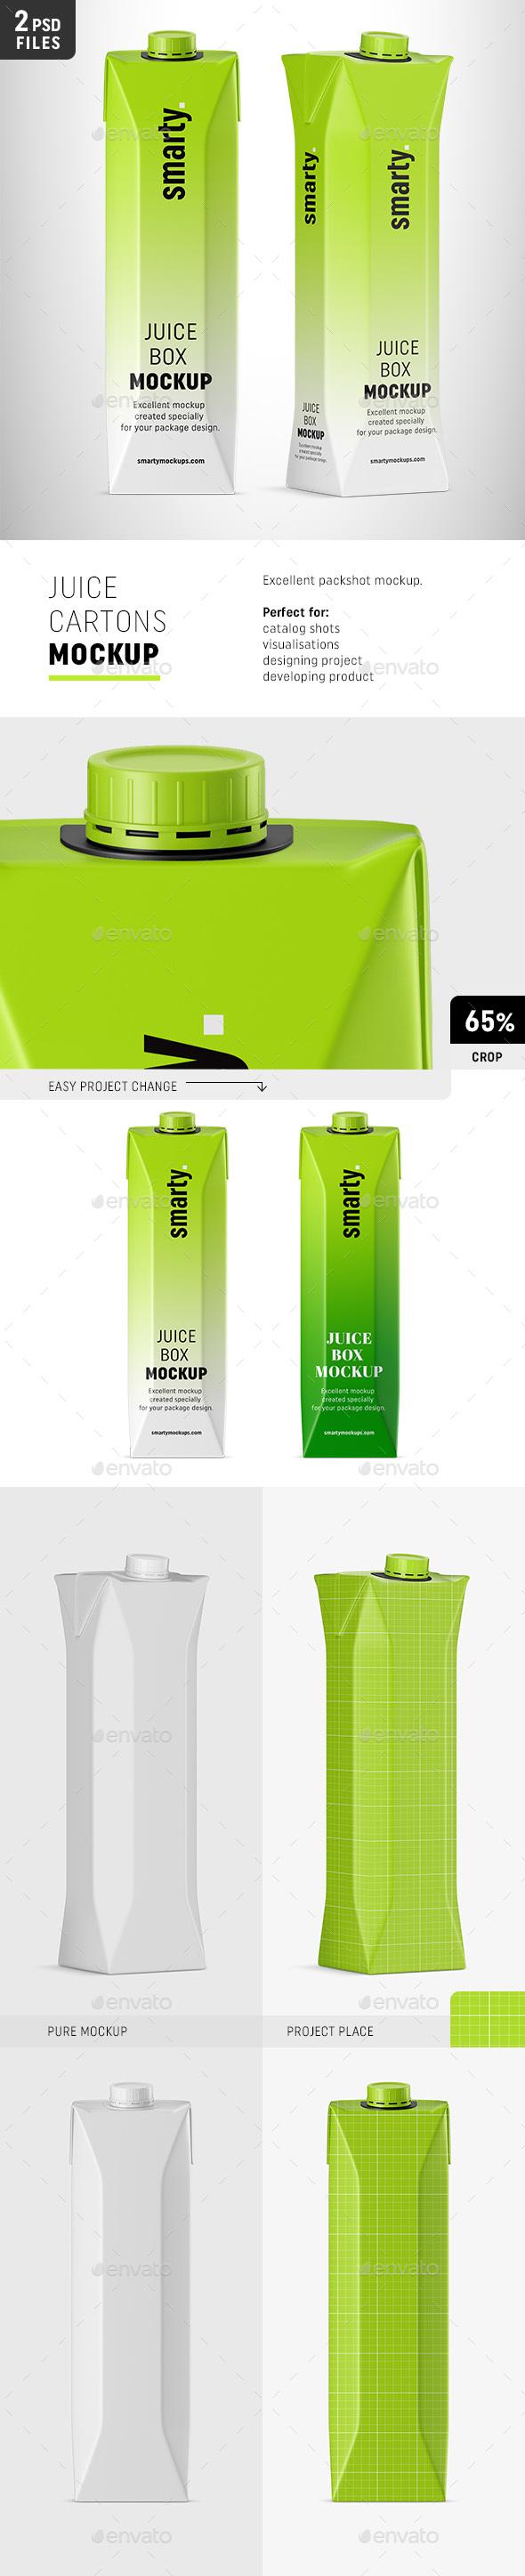 Carton Juice Mockups - Food and Drink Packaging